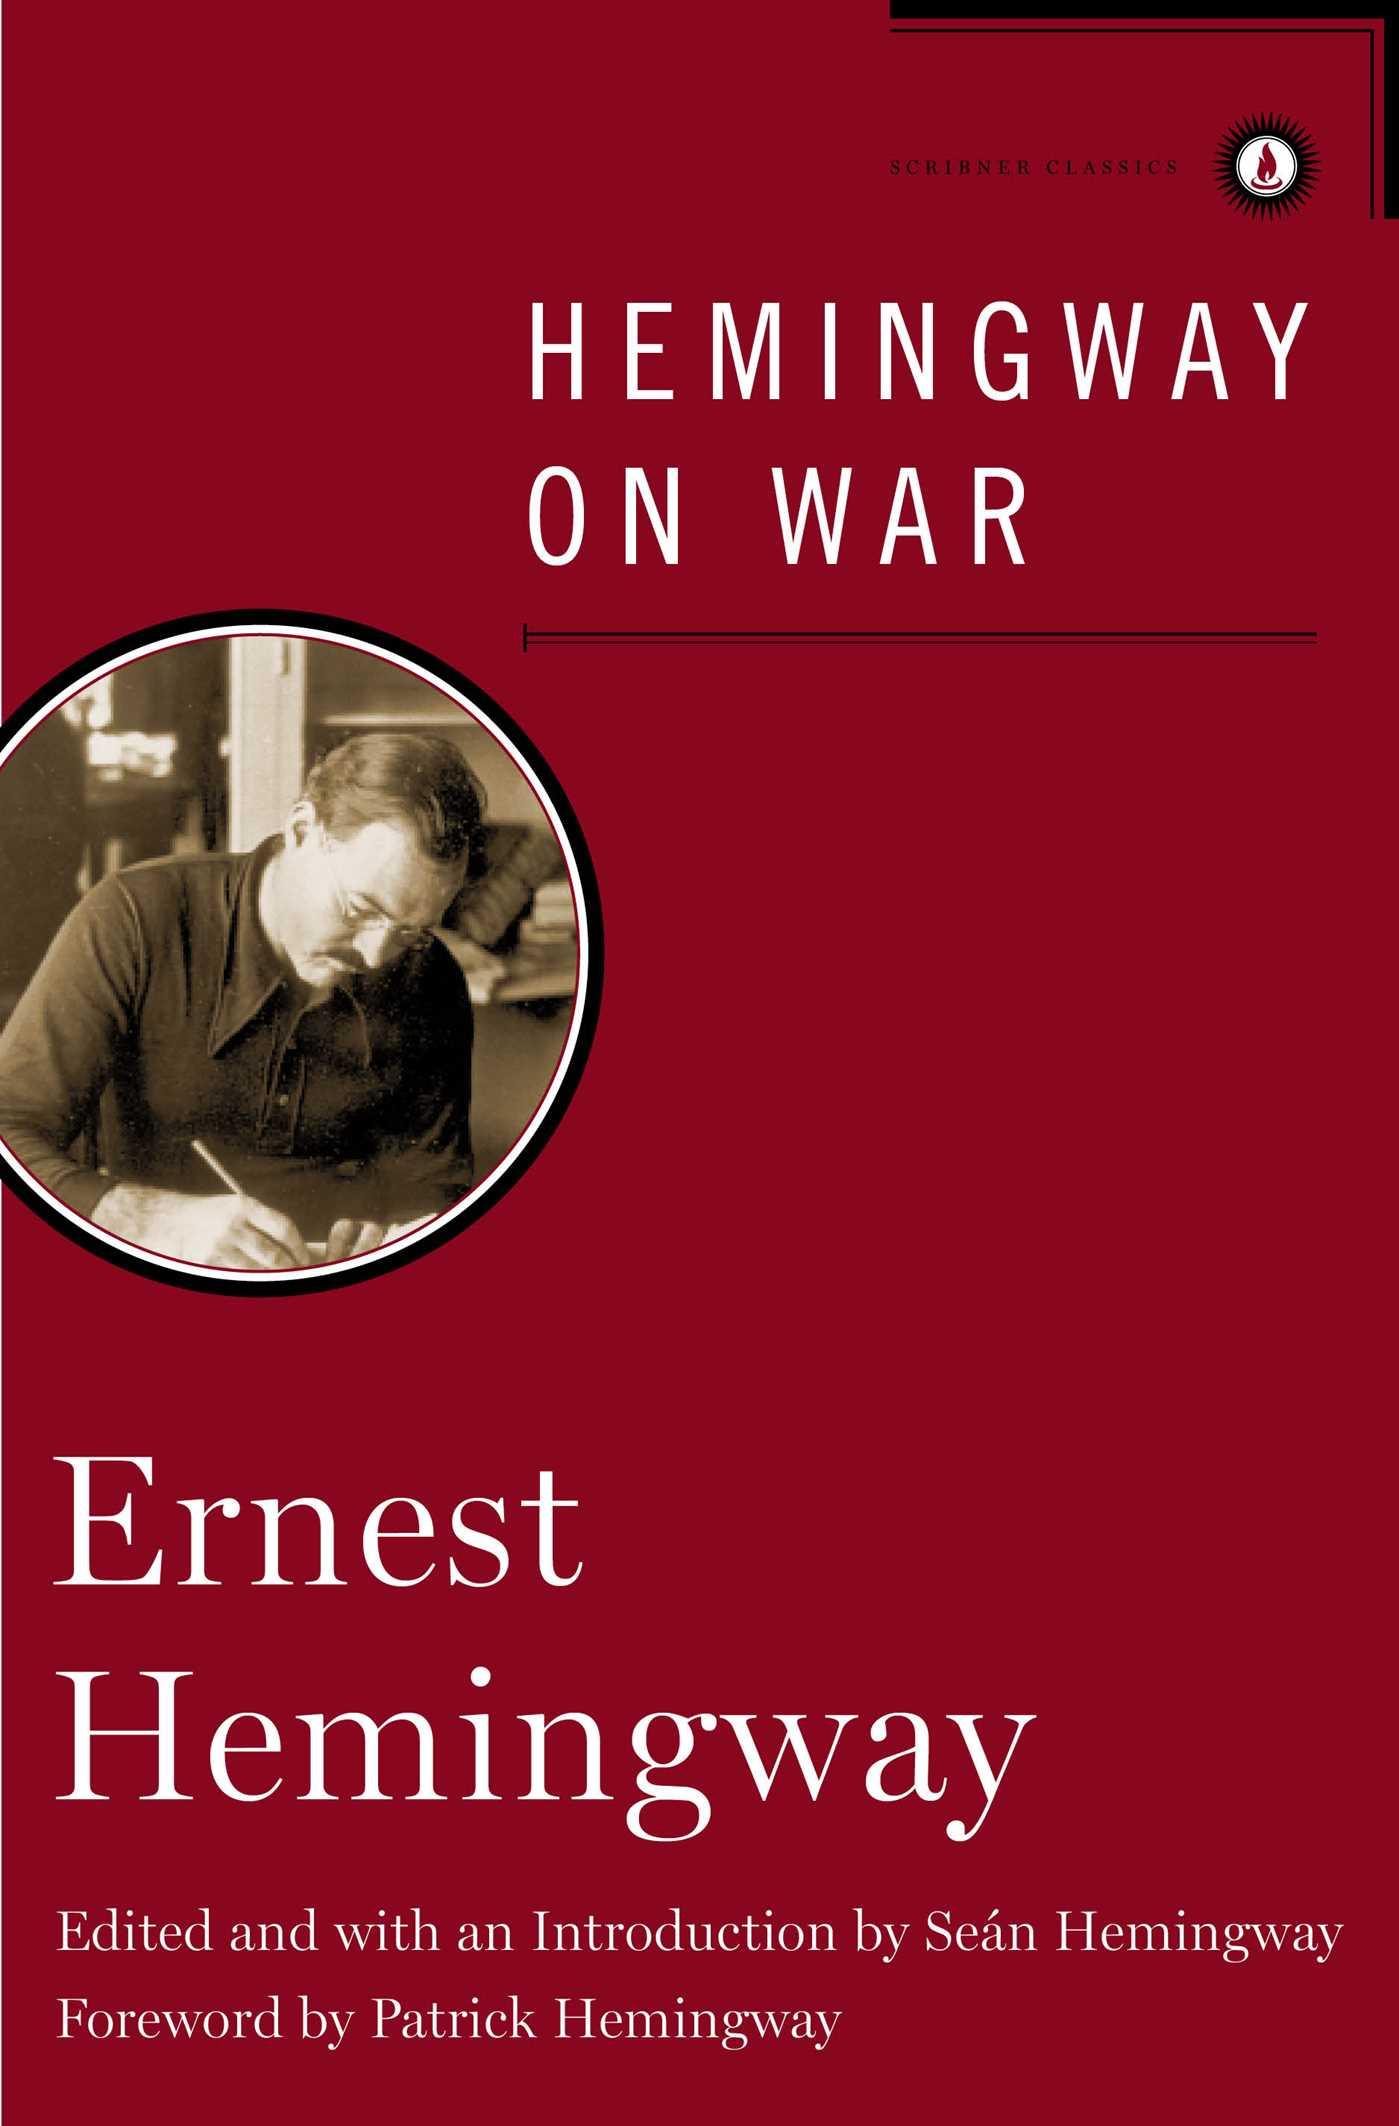 Hemingway on war 9781476716046 hr